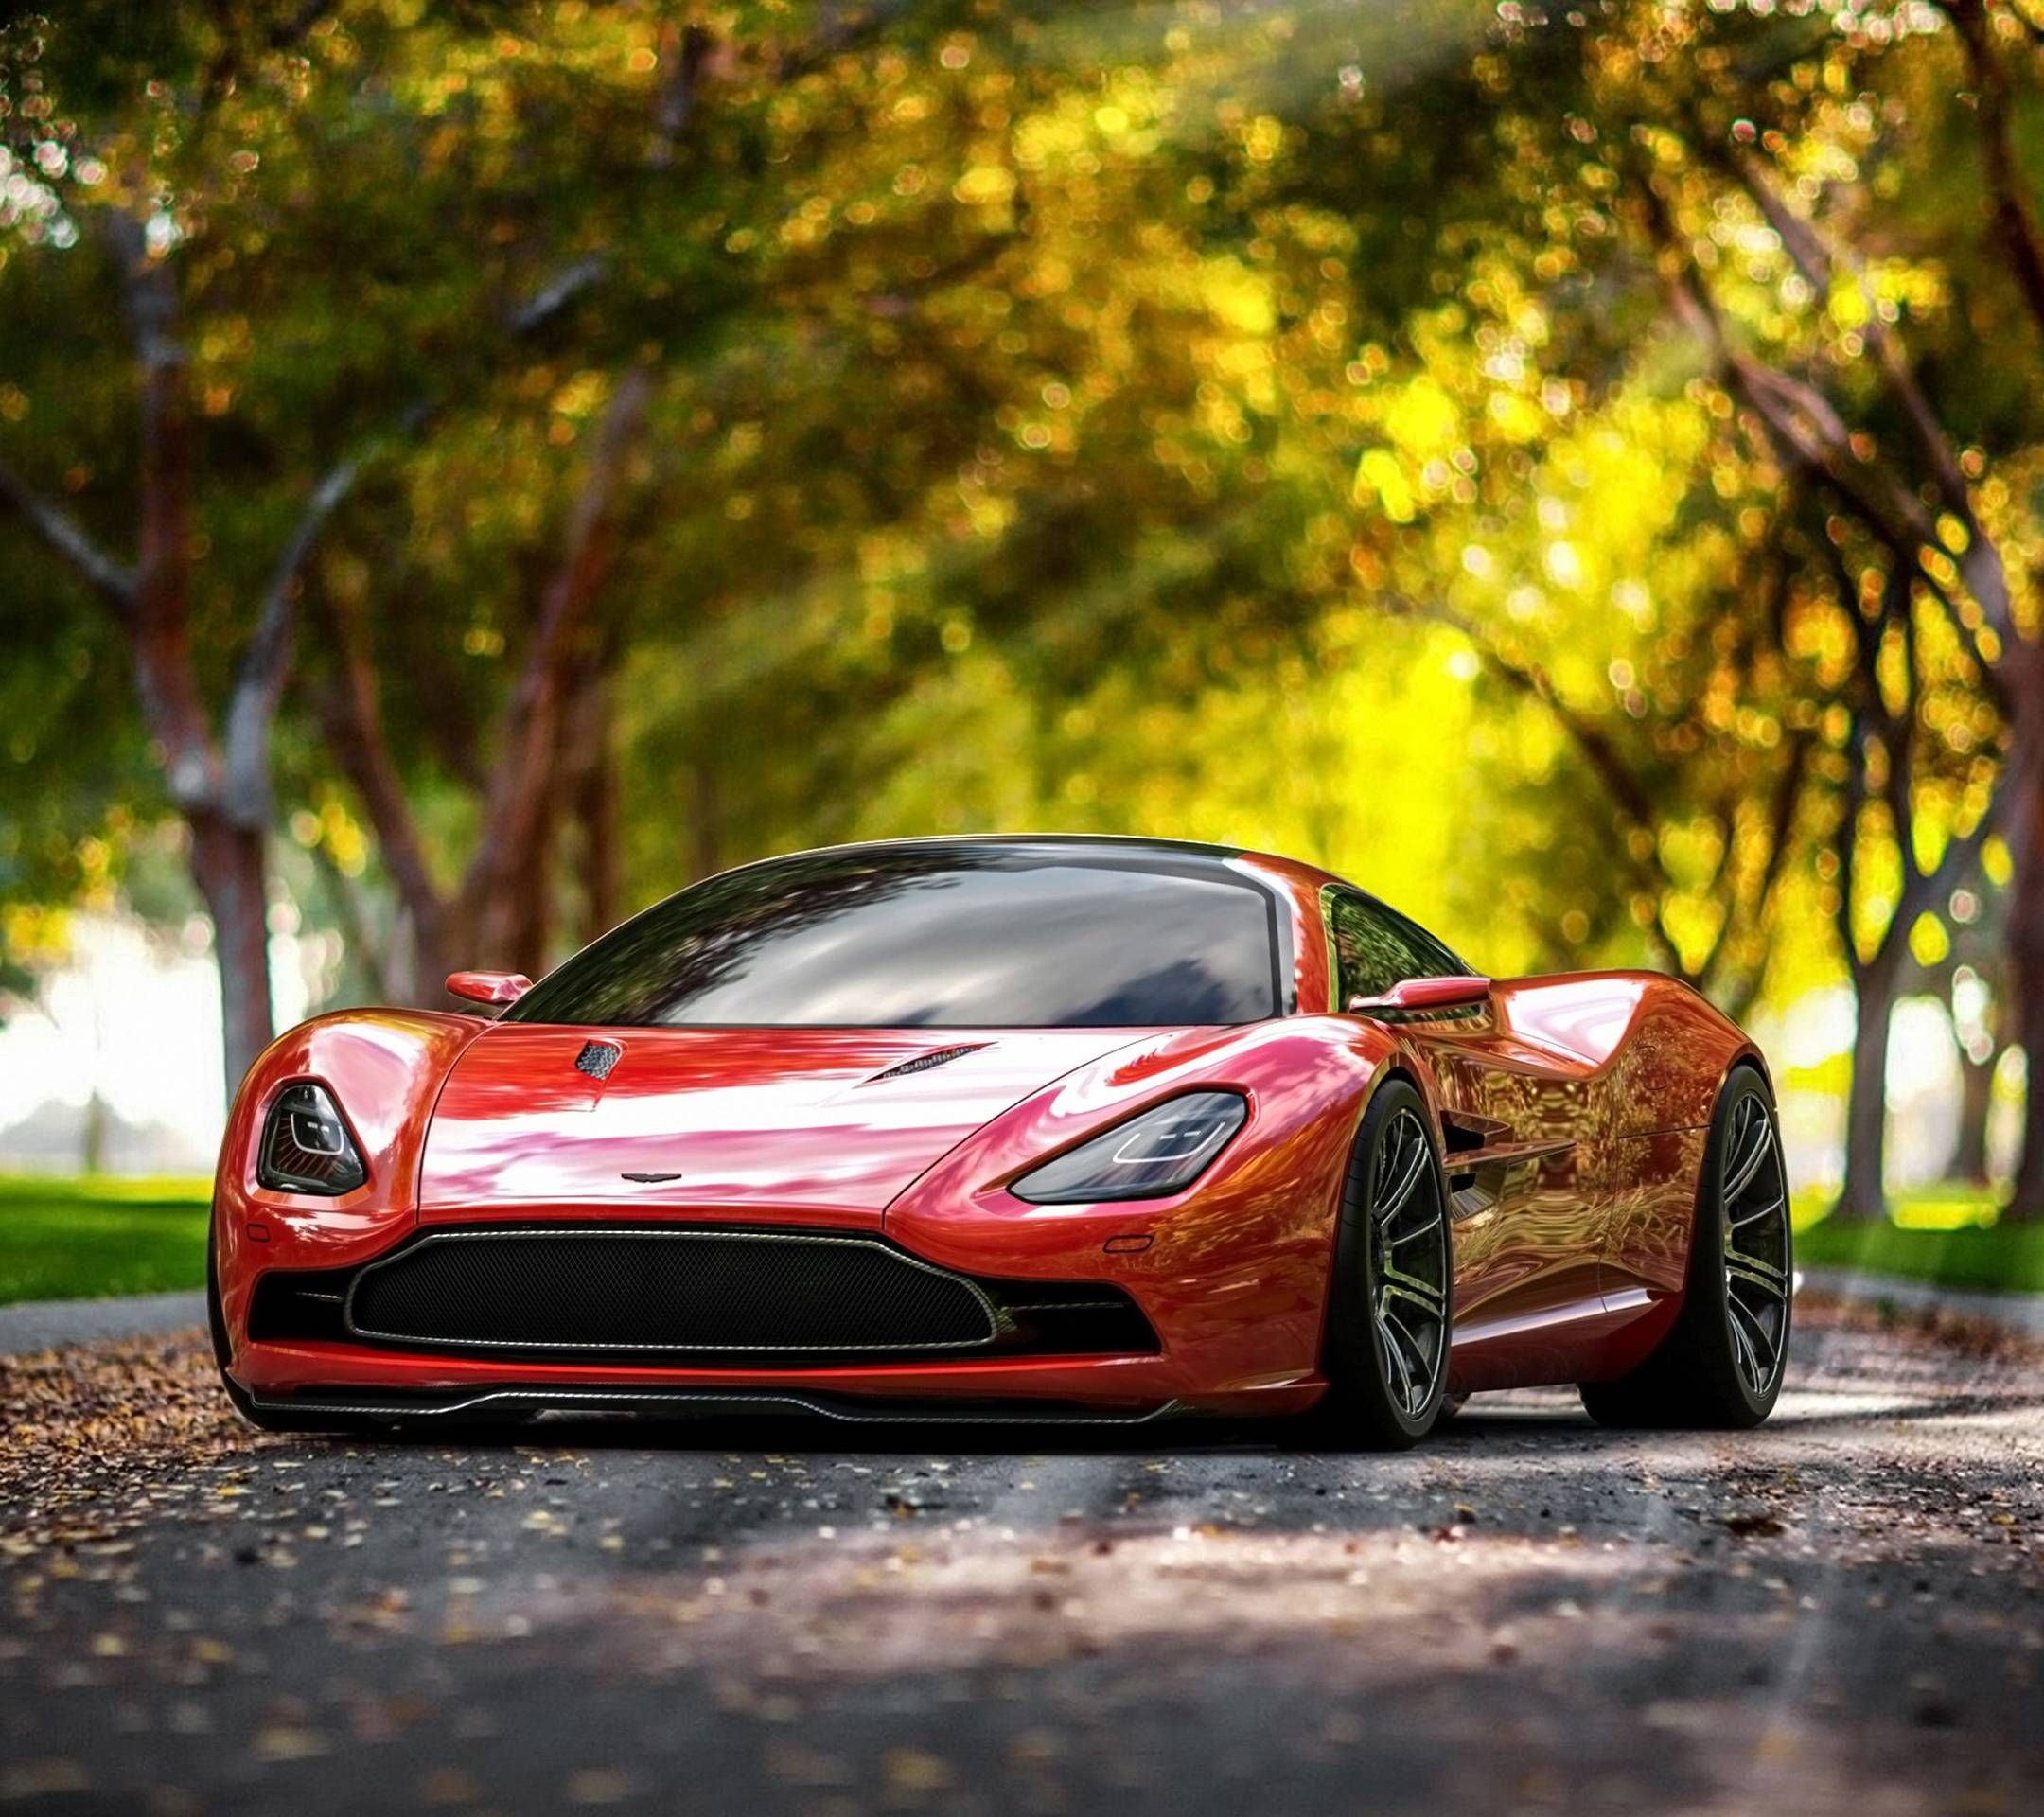 Aston Martin Concept: Aston Martin Dbc 7[2160x1920]